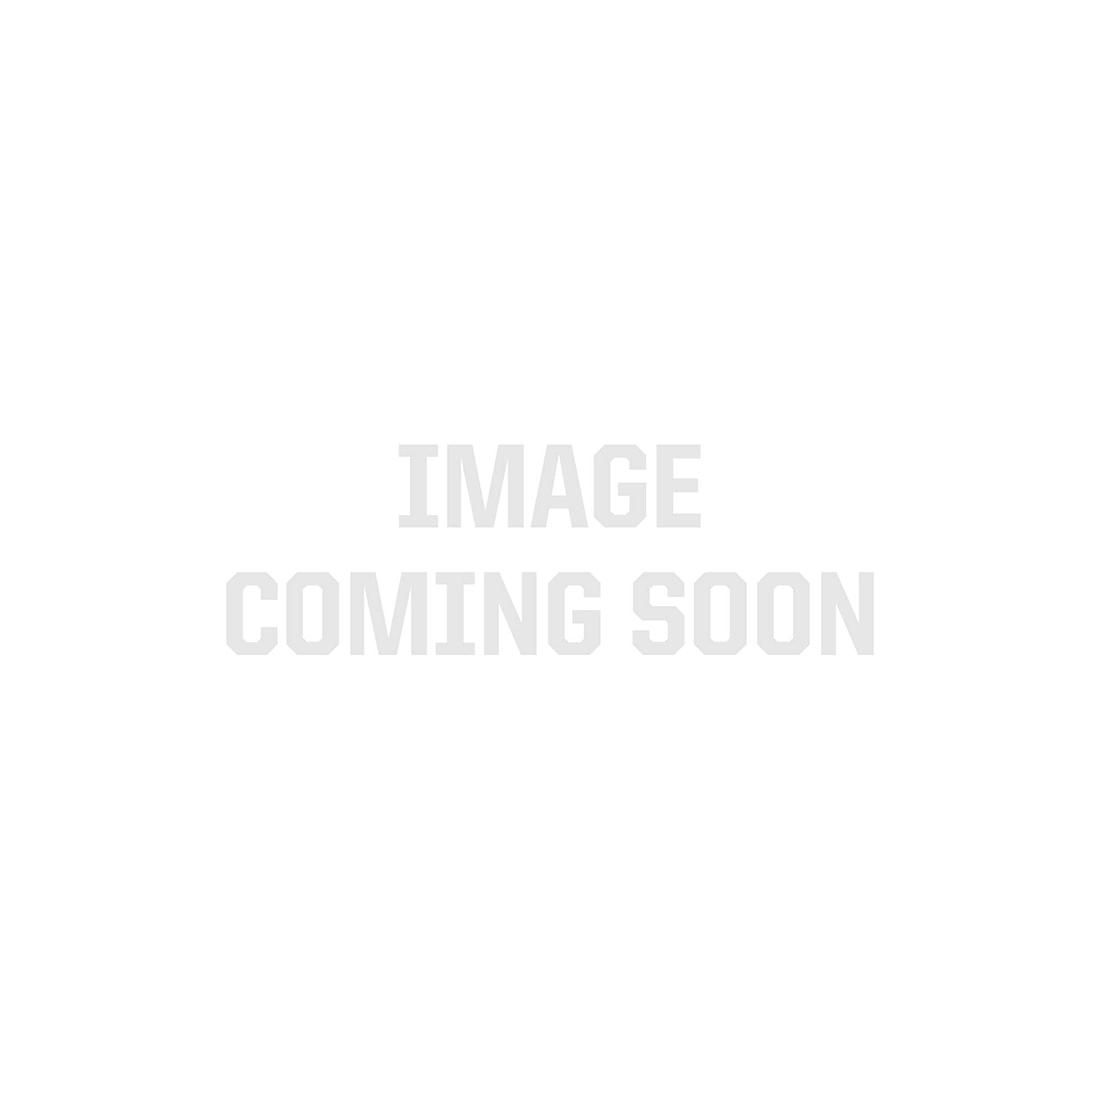 Waterproof Amber 5050 LED Strip Light, 60/m, 10mm wide, Sample Kit